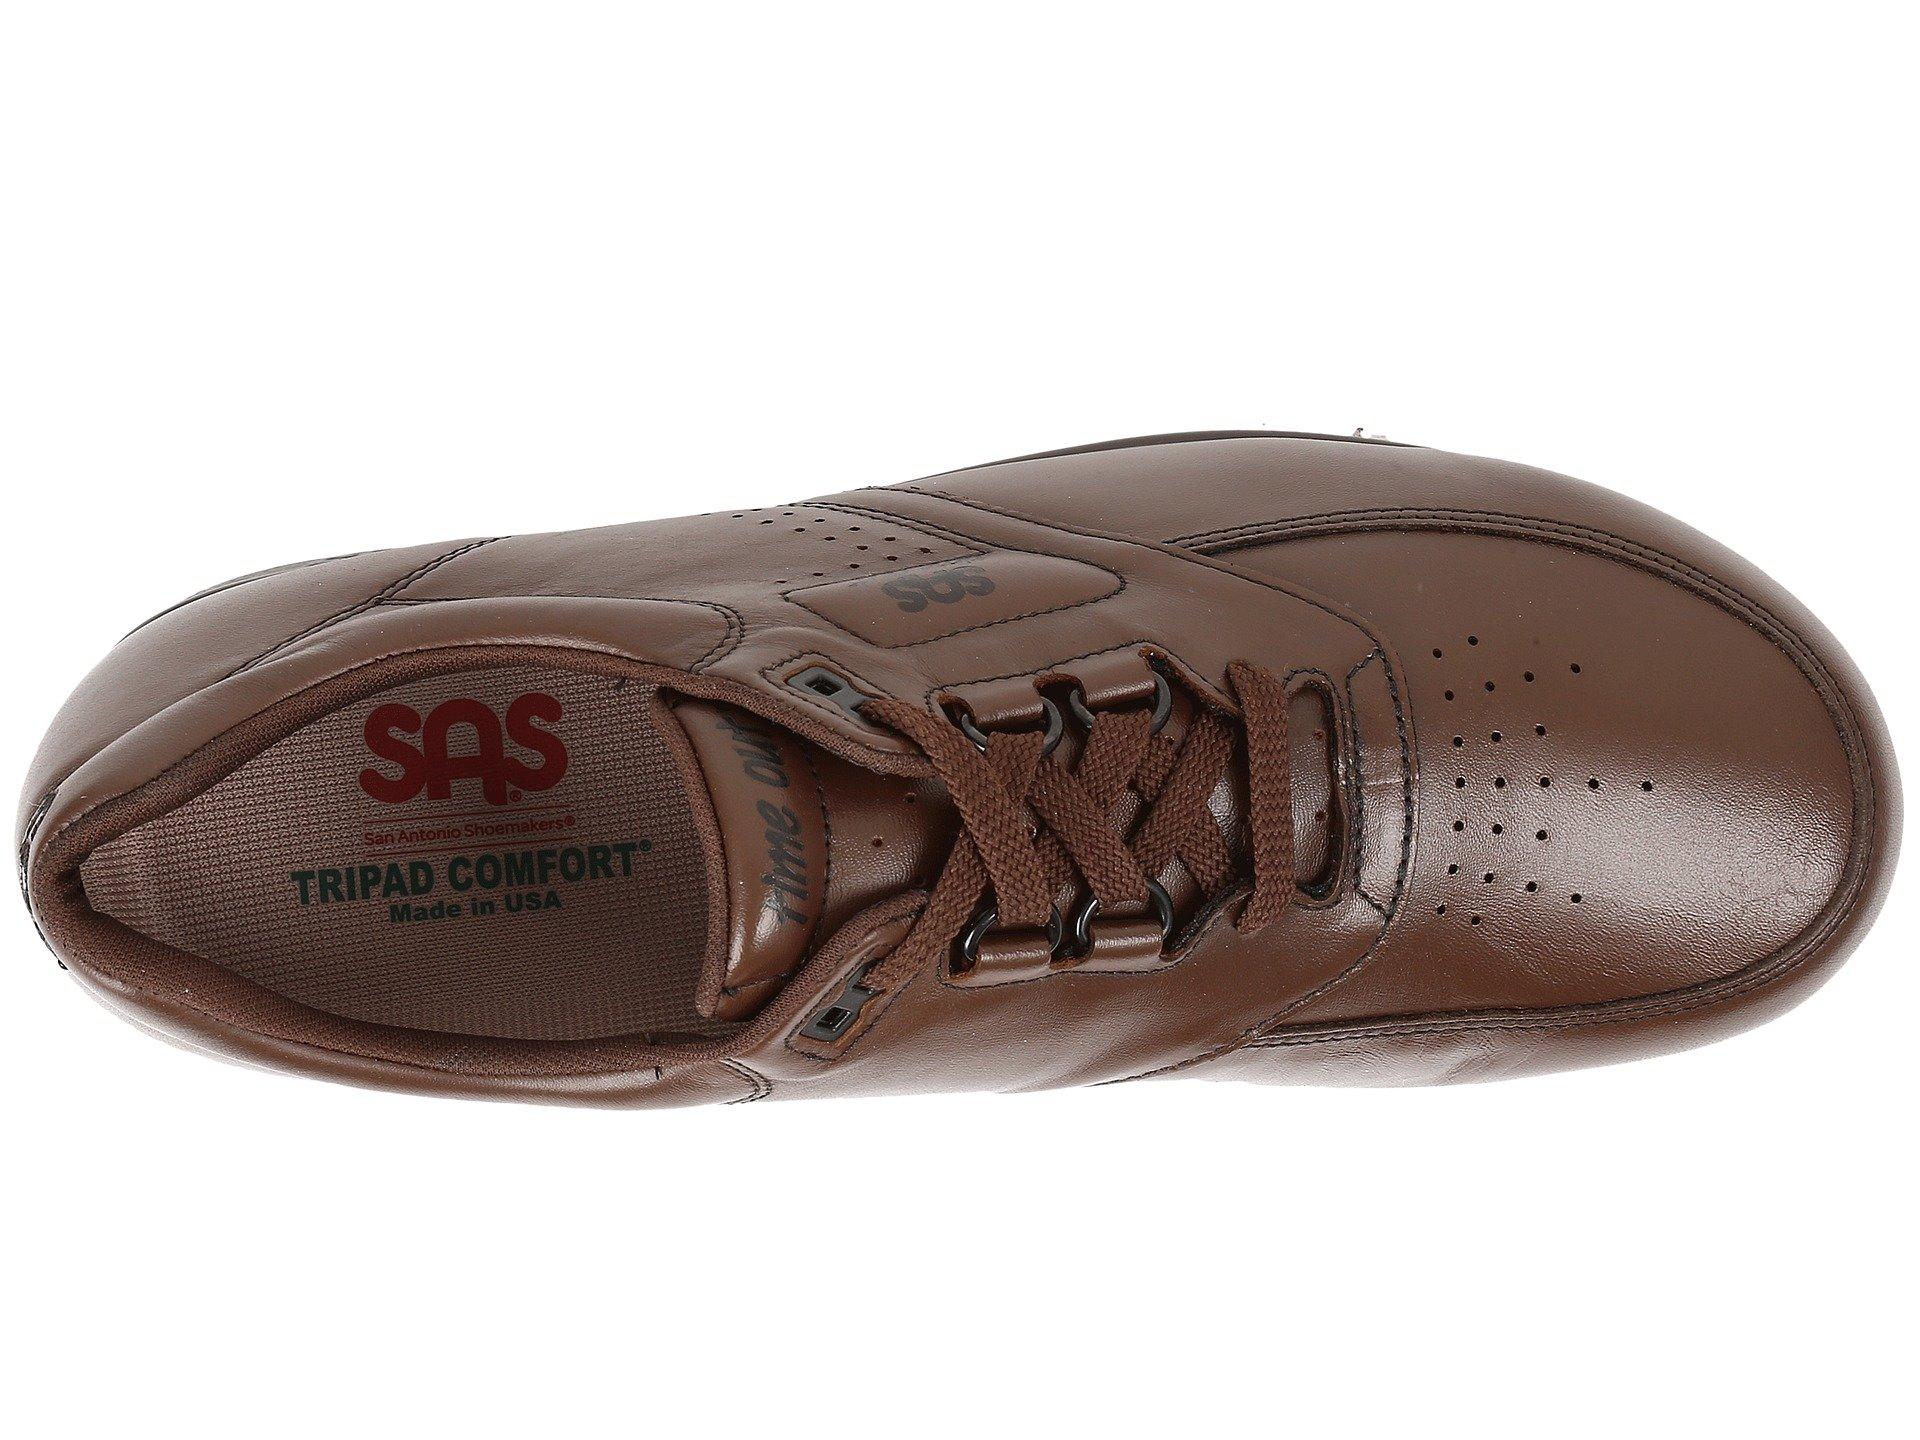 Sas Guardian Shoes Reviews